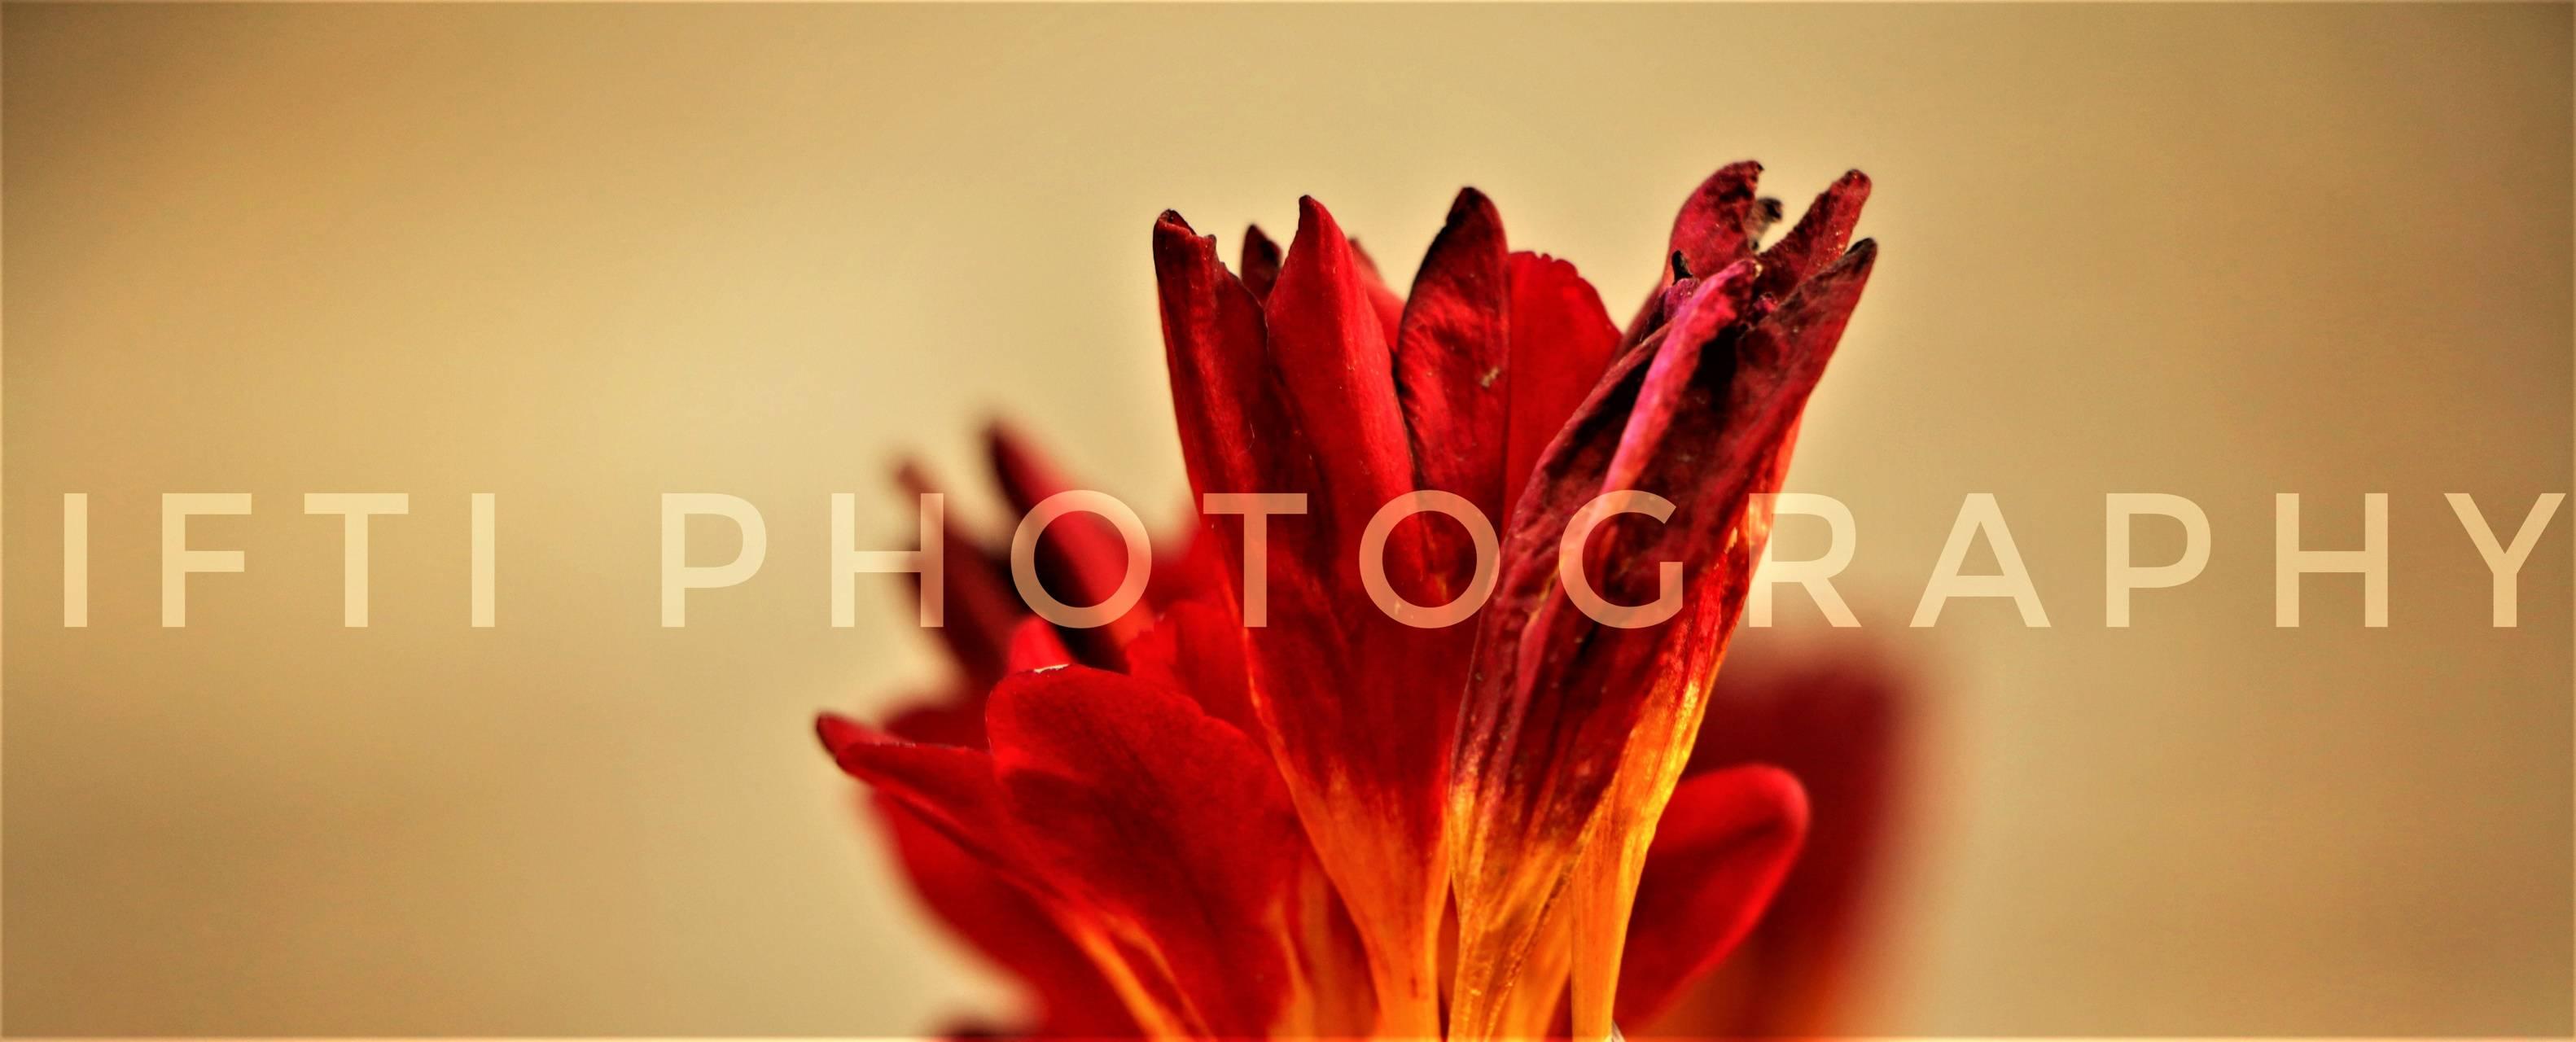 ifti photography